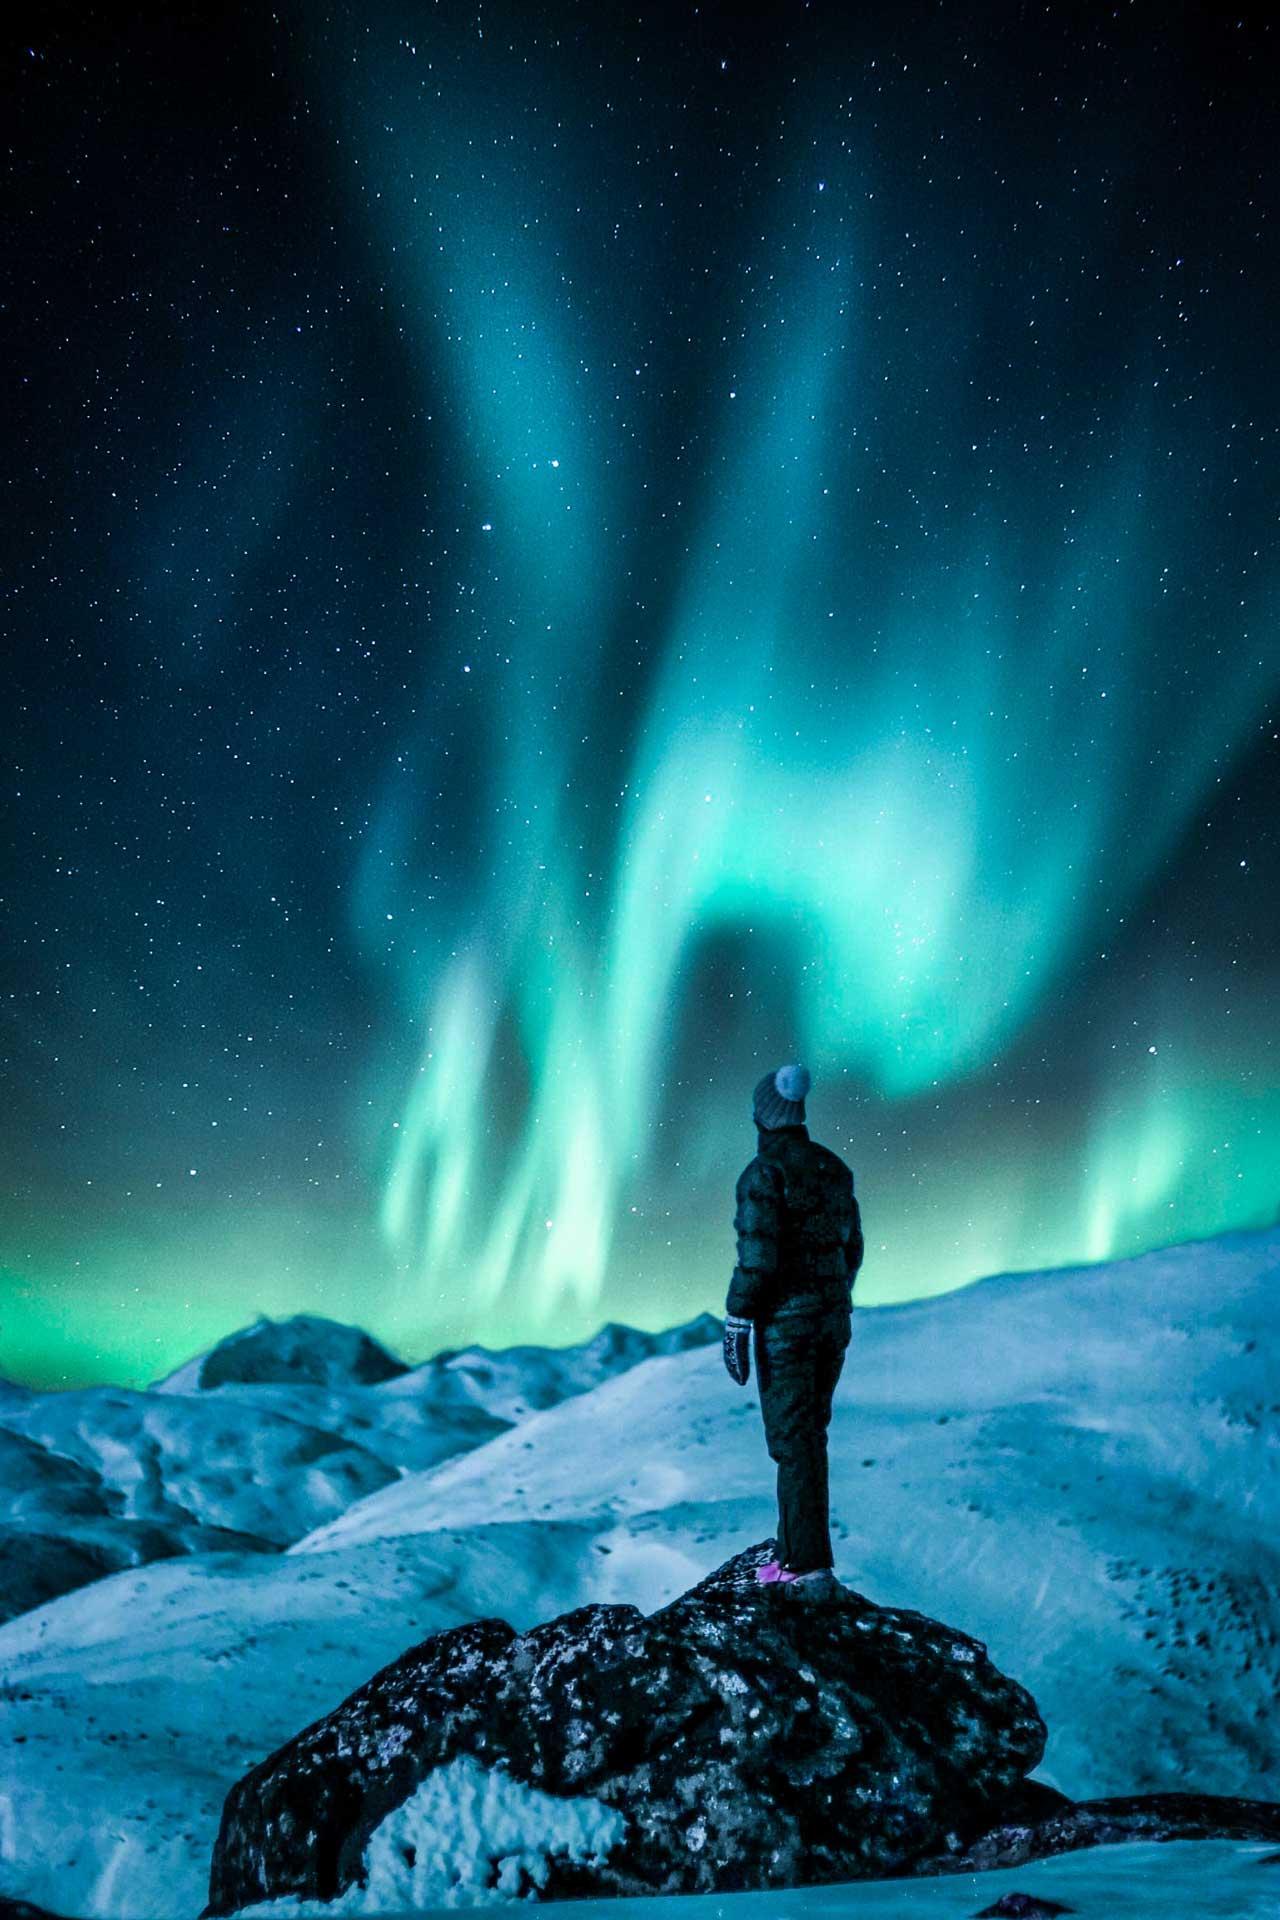 foto di Tobias Bjørkli da <a href='https://www.pexels.com/it-it/foto/alba-astrologia-astronomia-atmosfera-1853354/' target='_blank'>Pexels</a>